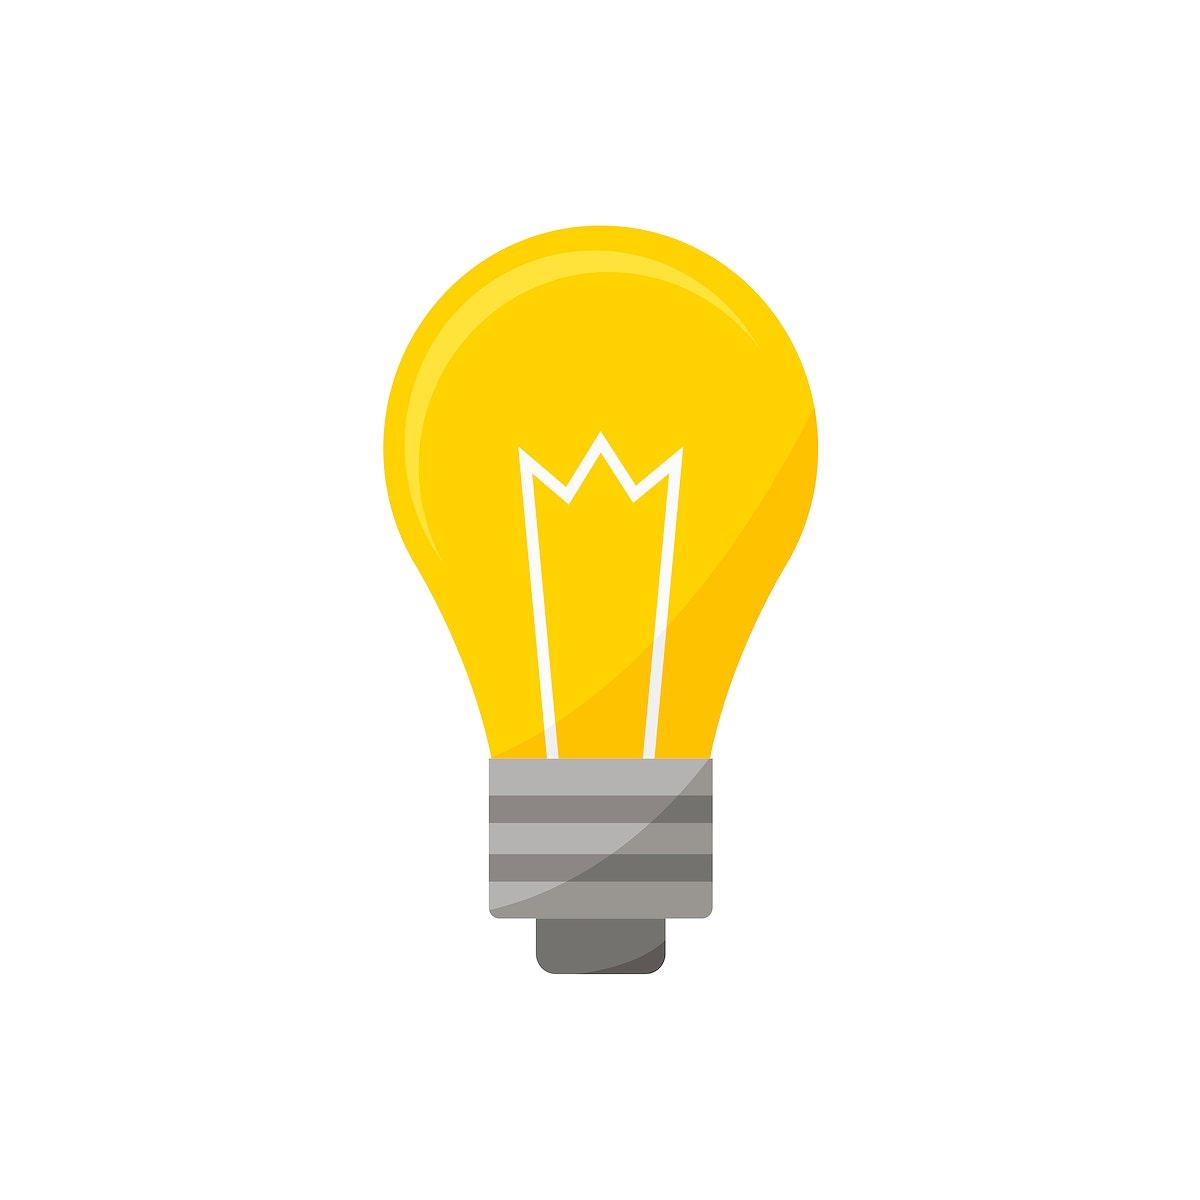 Light bulb icon graphic illustration